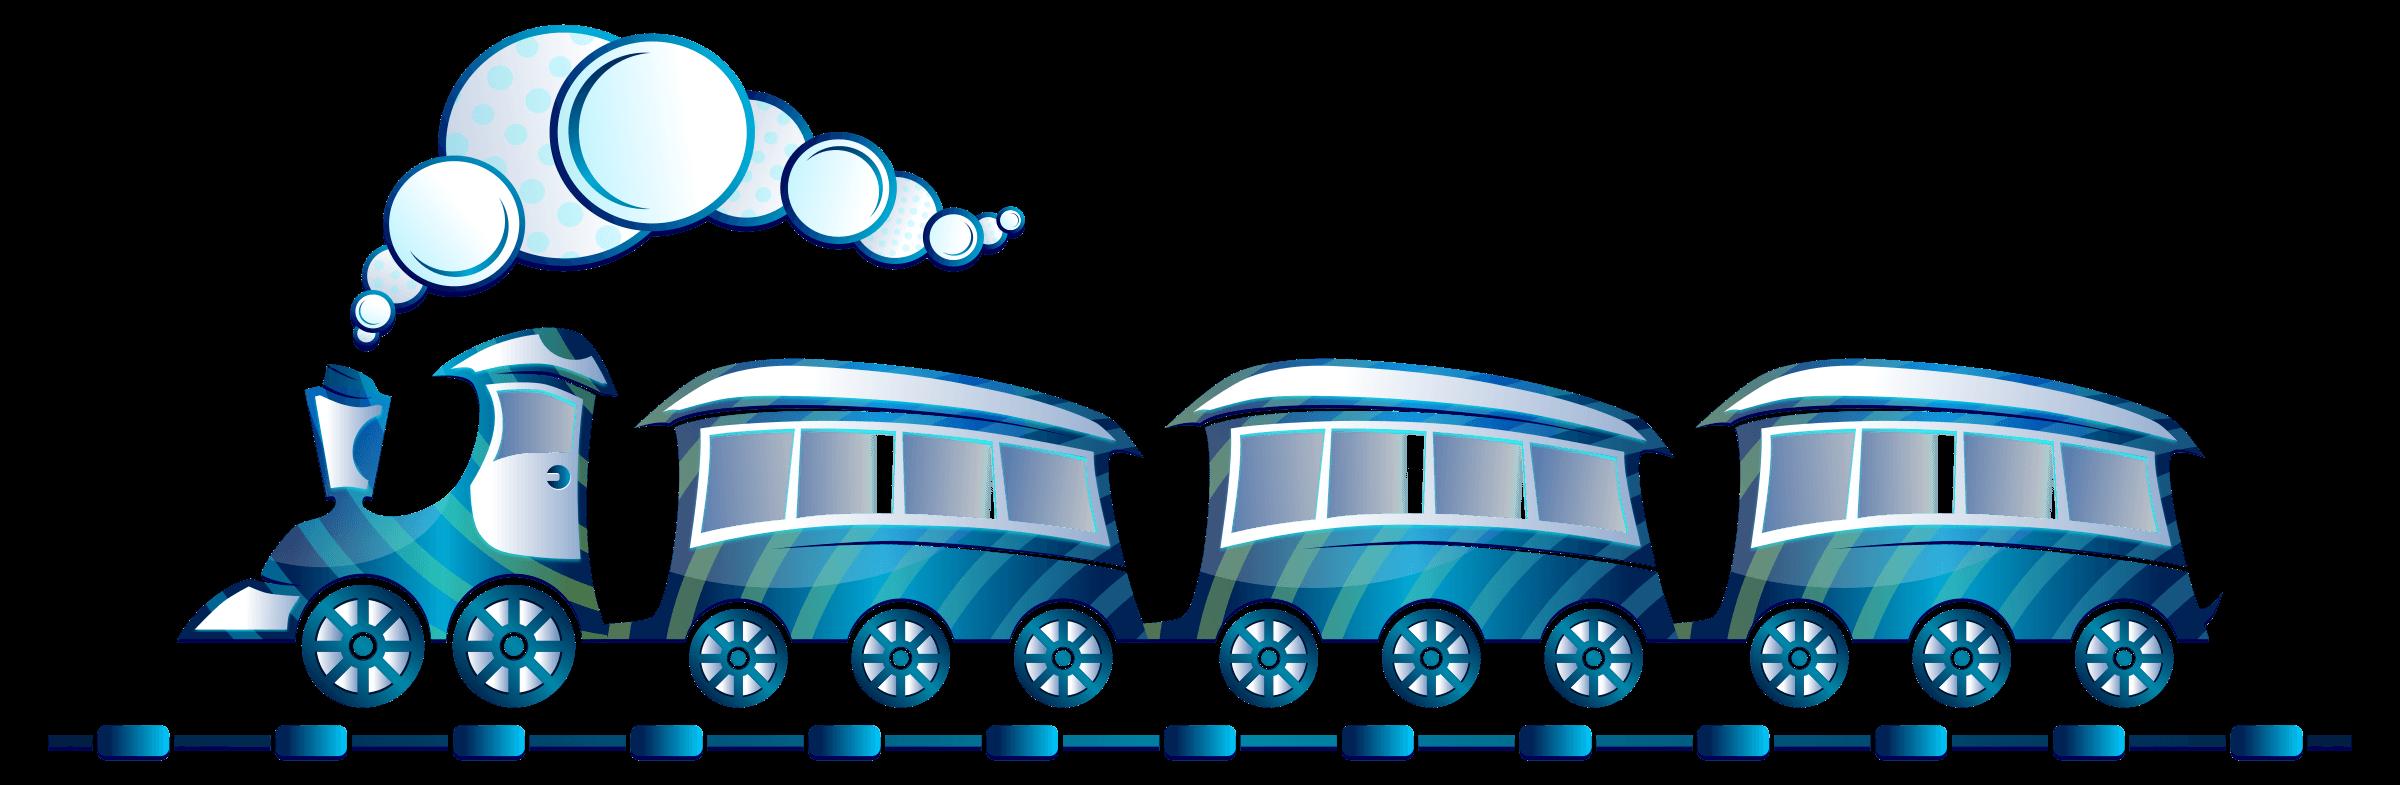 2400x785 Santa Train Cliparts